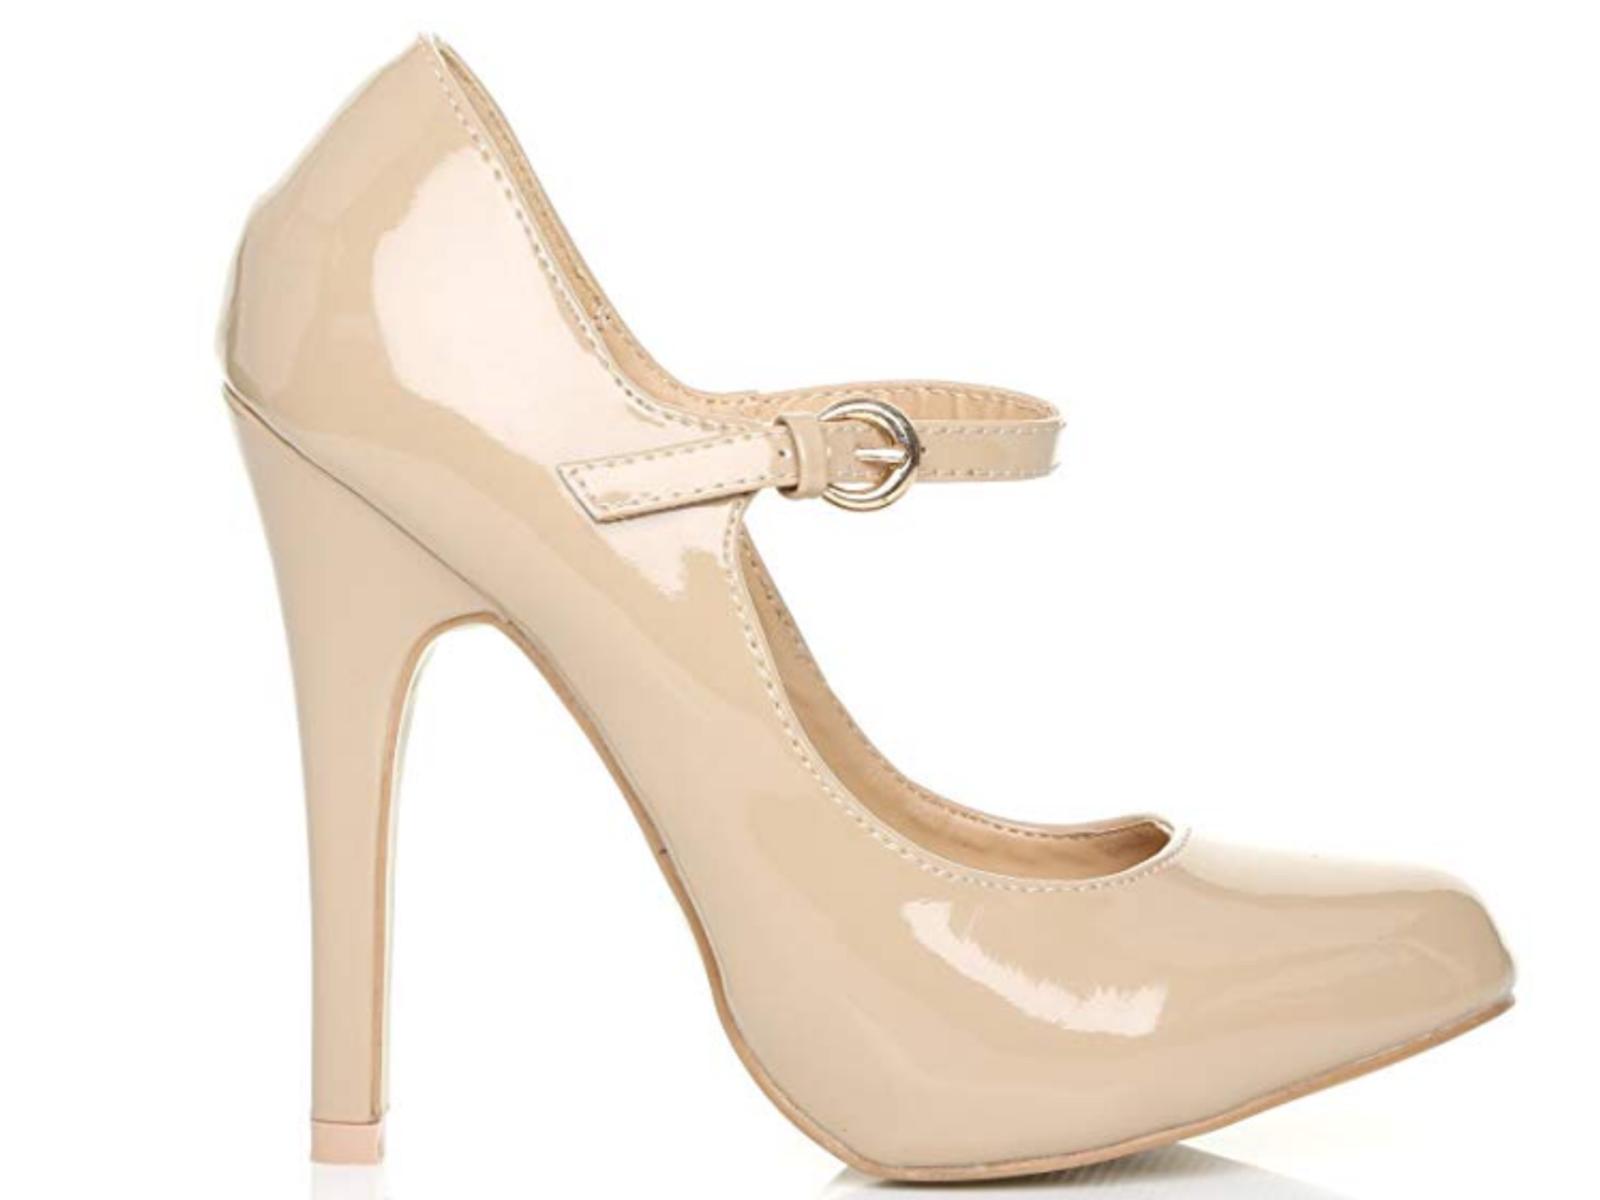 Shu Wish UK Nude Patent läder läder läder Mycket High Mary Jane Storlek 9 Stilettos  köpa billigt